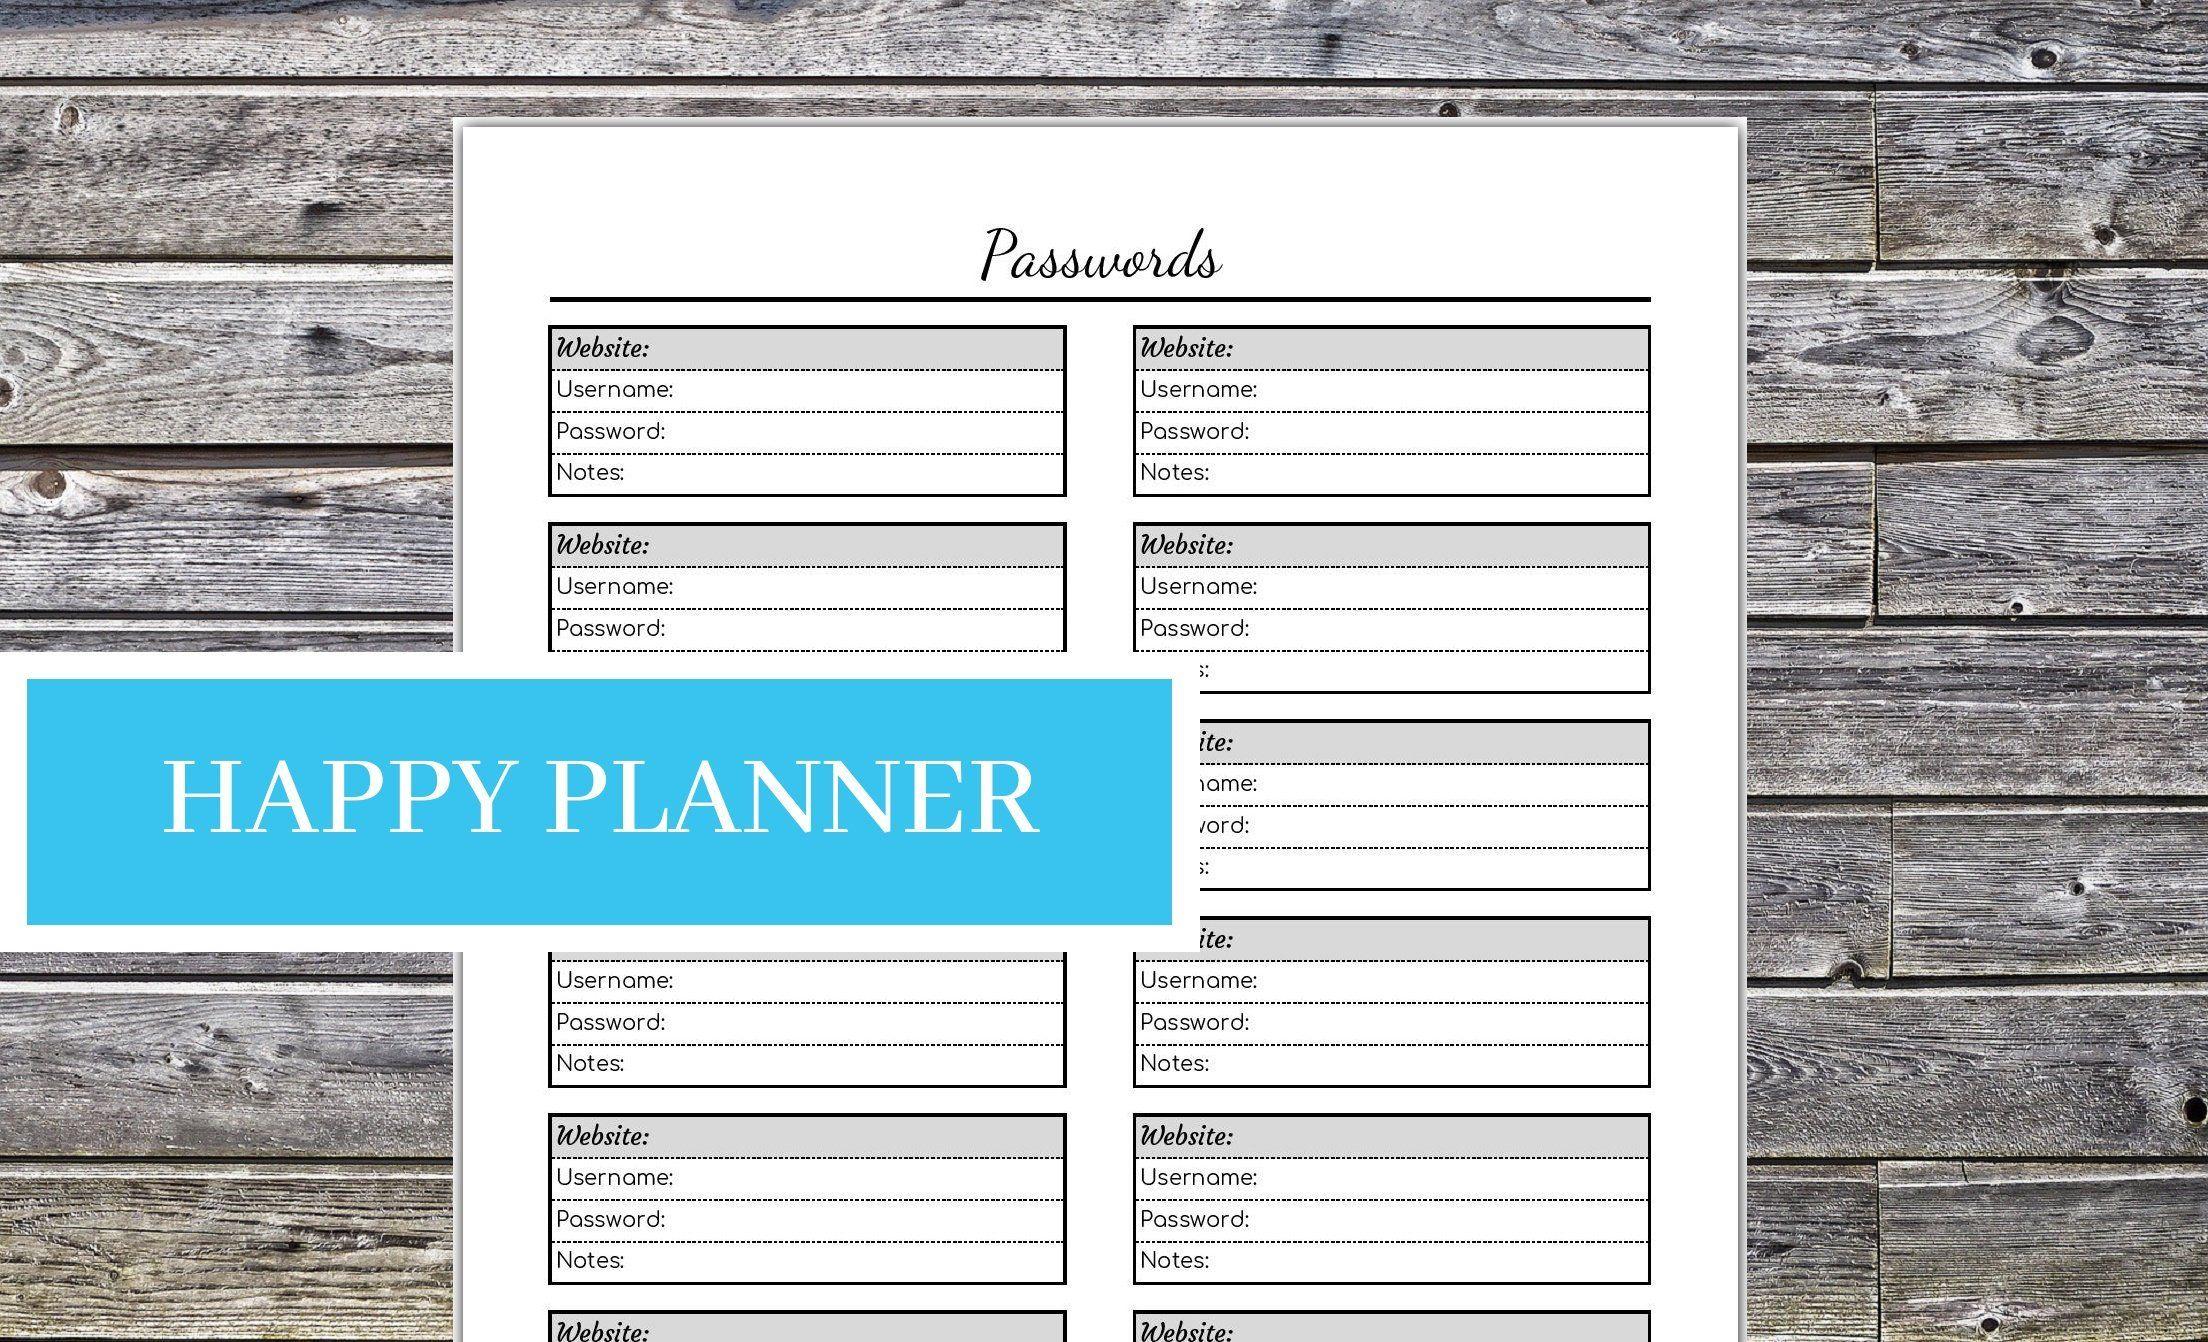 Happy Planner Password Tracker Editable Printable